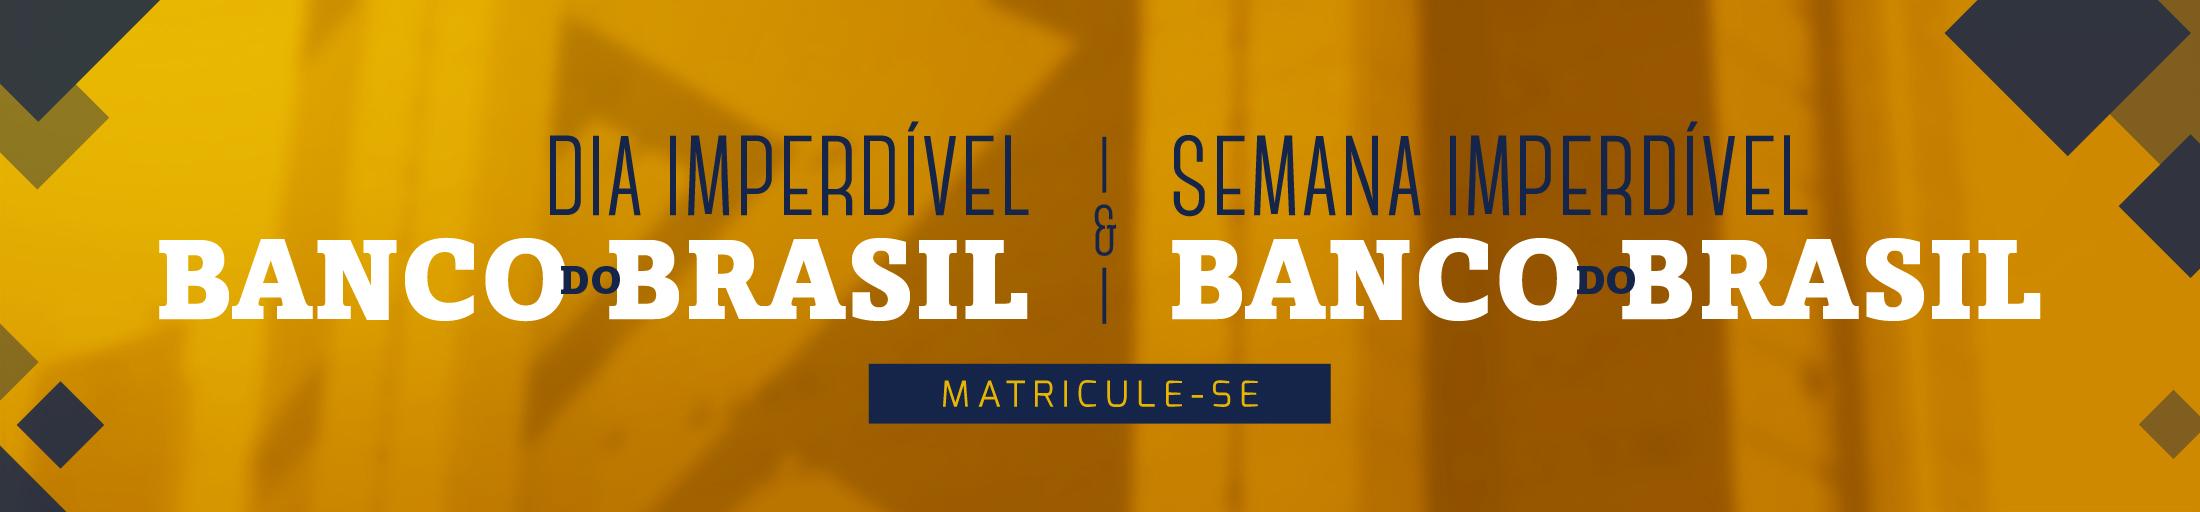 BANNER-SITE-DIA-SEMANA-IMPERDÍVEL-BANCO-DO-BRASIL